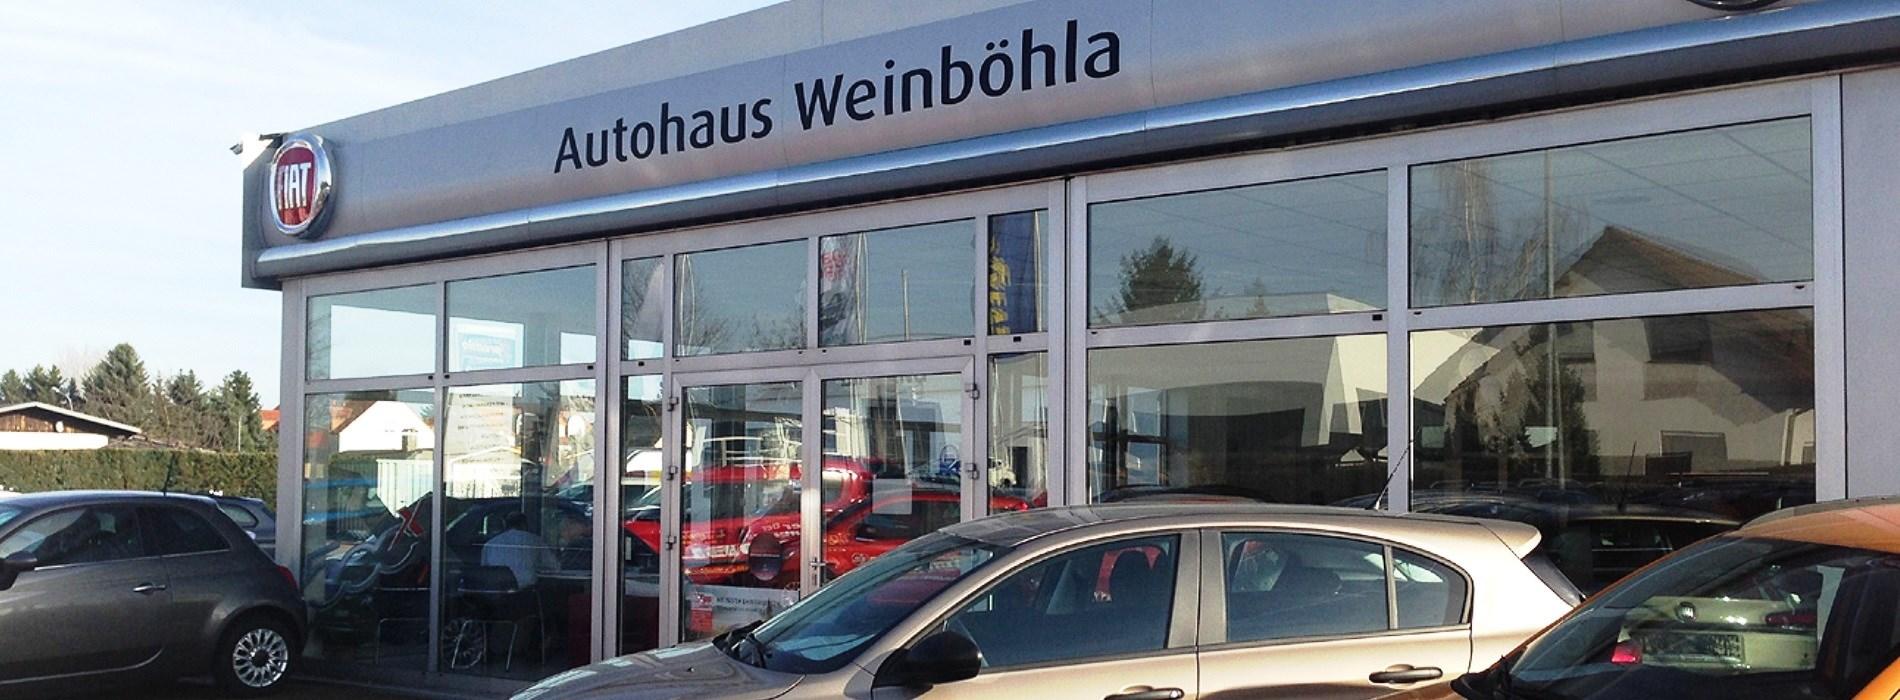 Autohaus Weinboehla